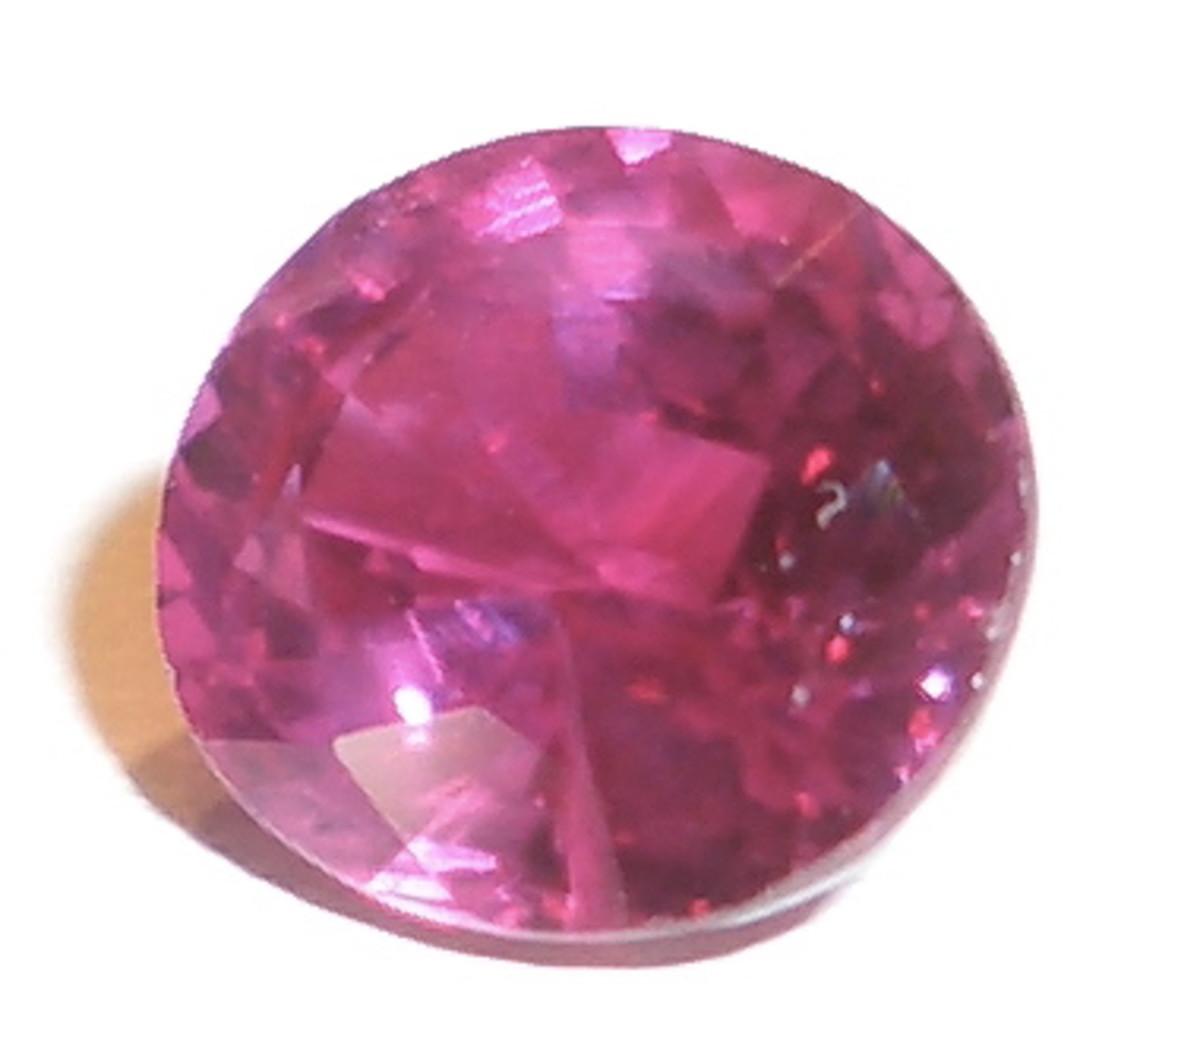 A Cut Pink Ruby